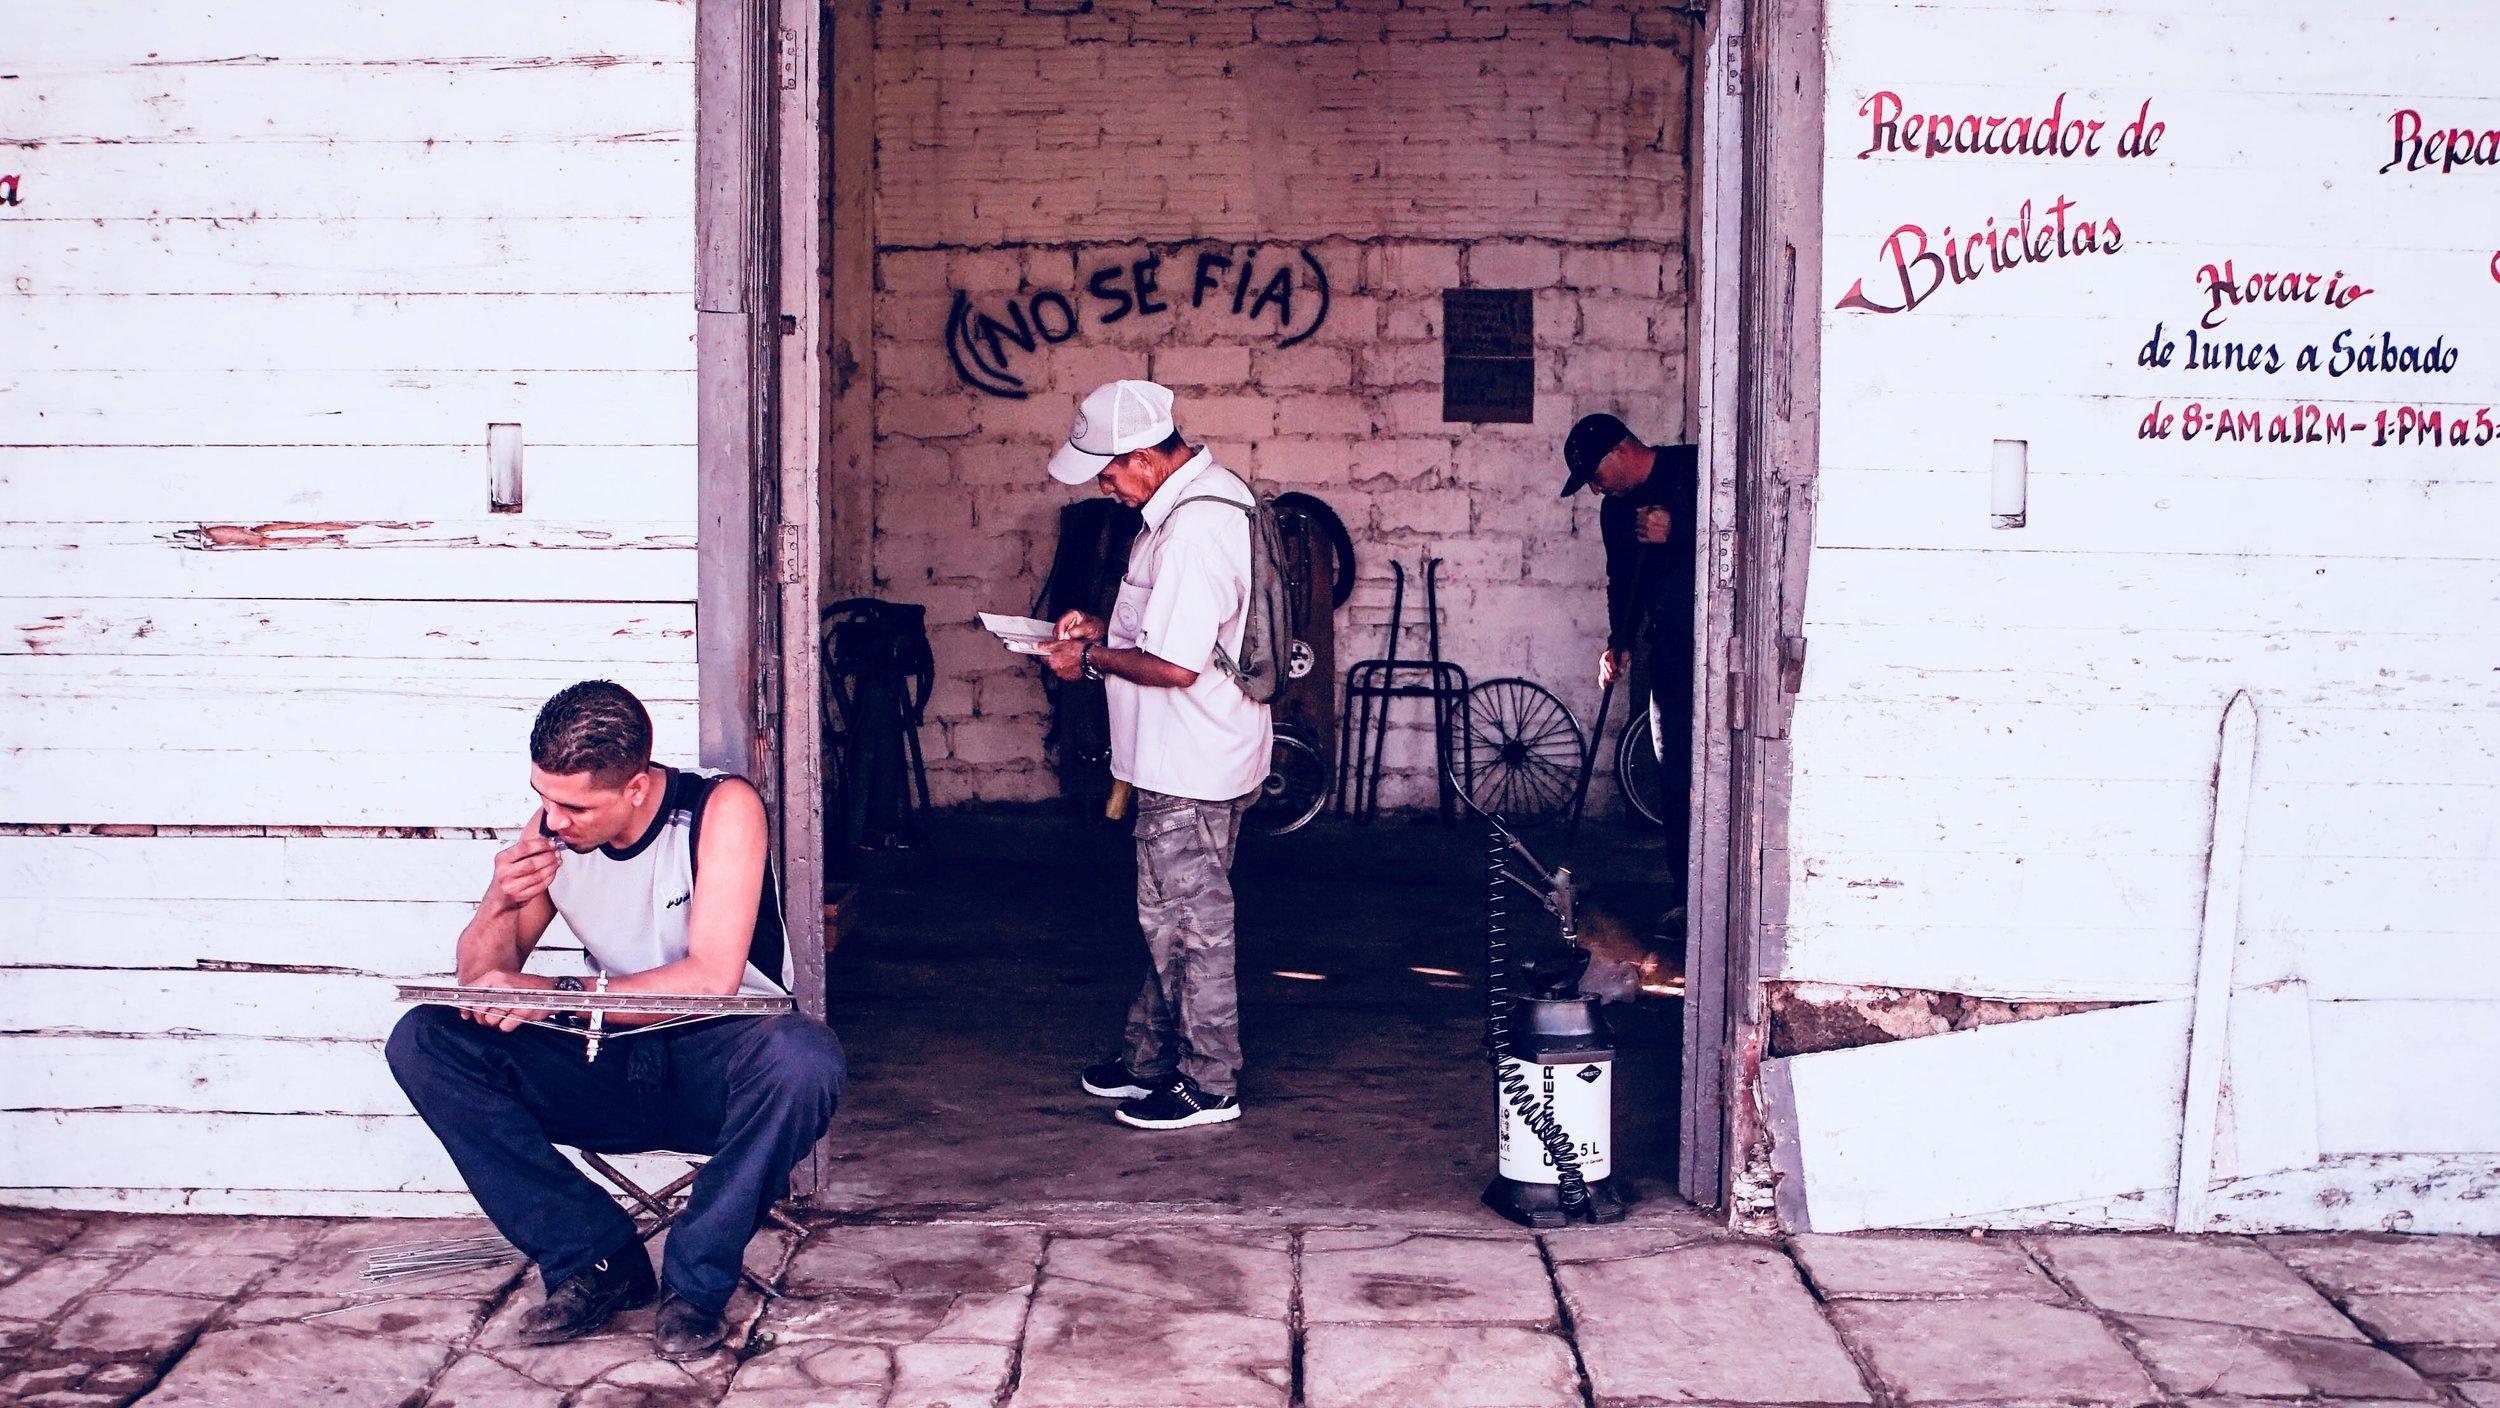 Consciously Connected Travel  -  Culturally Connected Experiences  - Travel and Wellness - My City Series | Amberly Alene Ellis - Cuban Photographer - Cuban Videographer- Photographer in Cuba - Photographer in Havana- Havana, Cuba